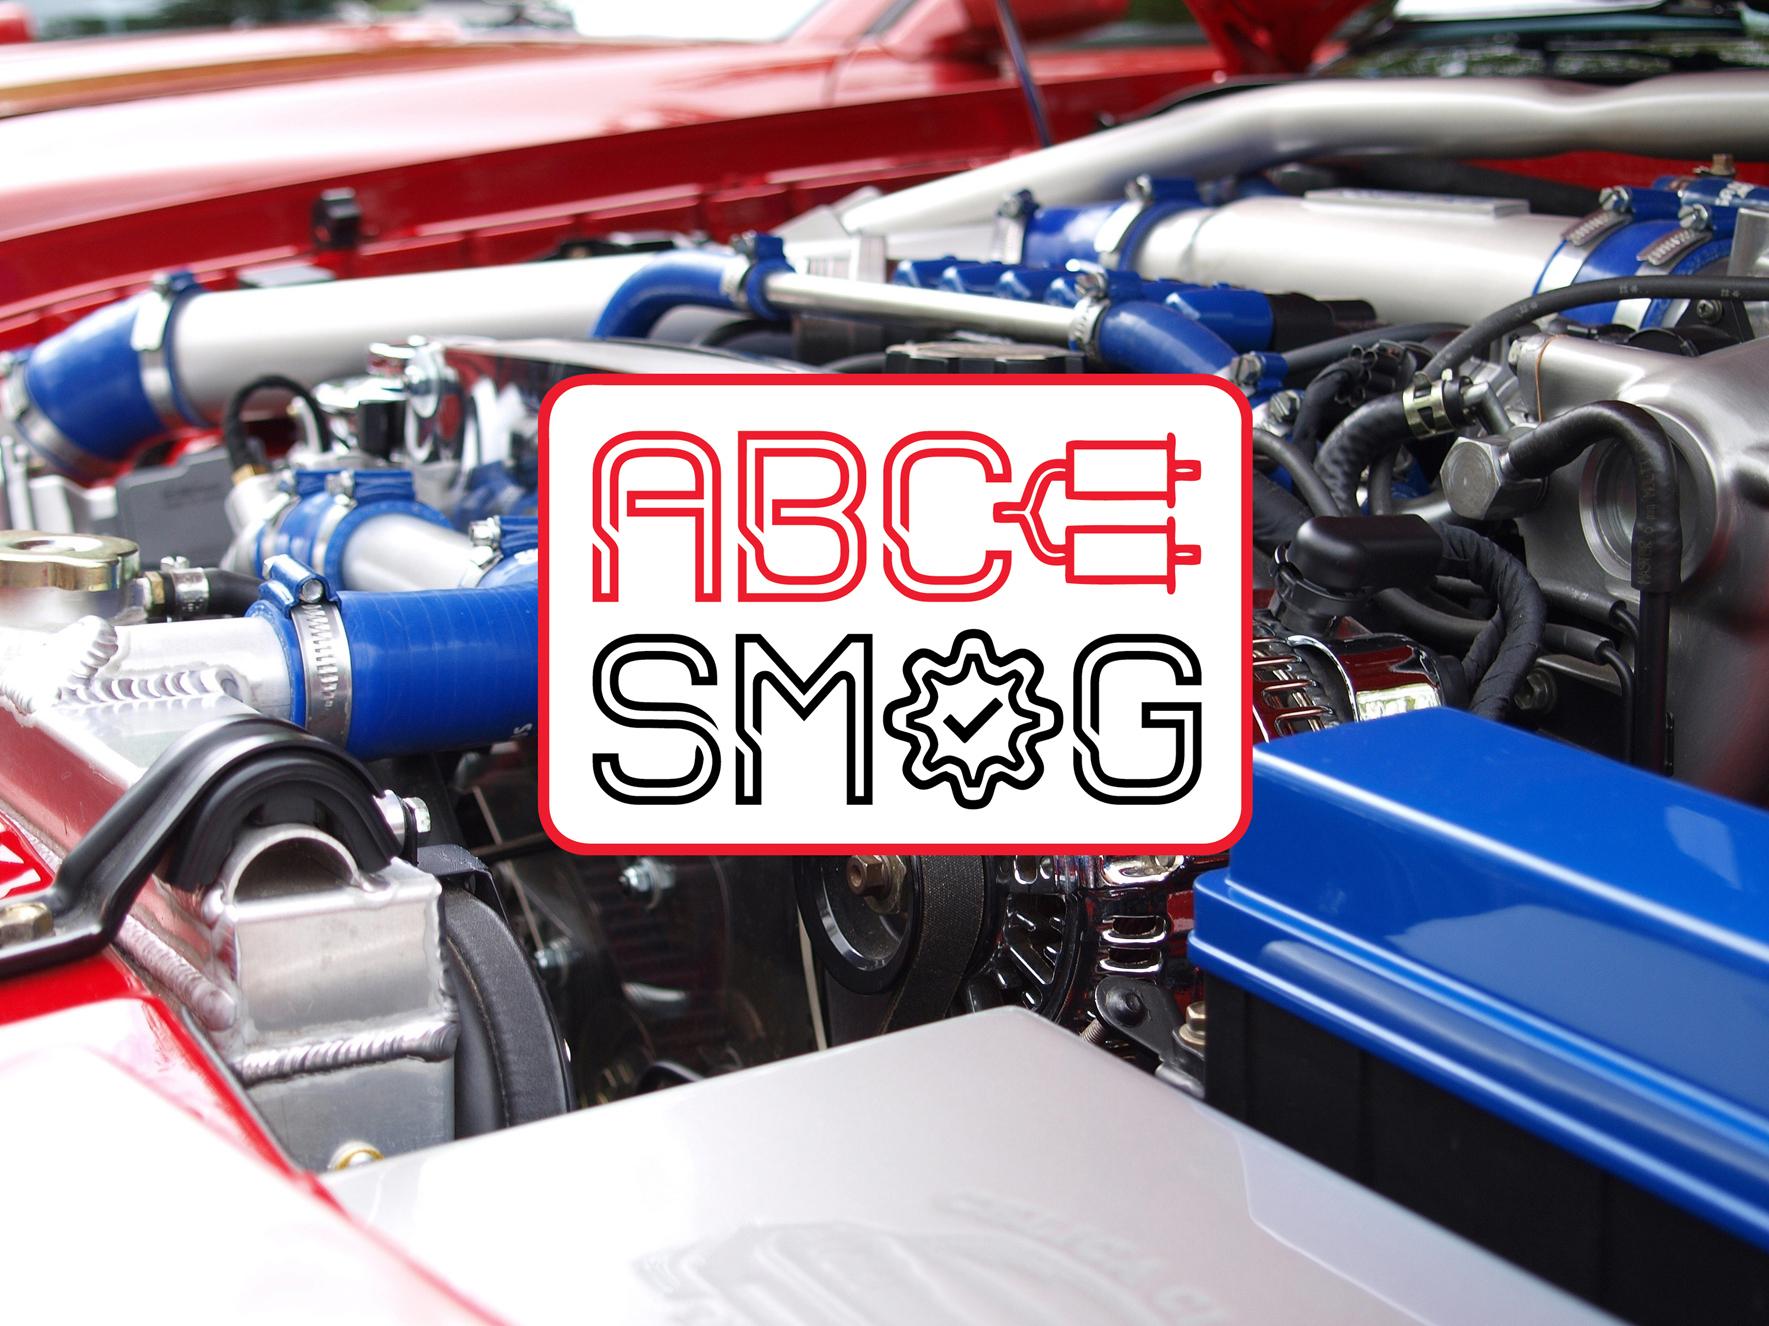 ABC Smog Logo on Stock Image Promo